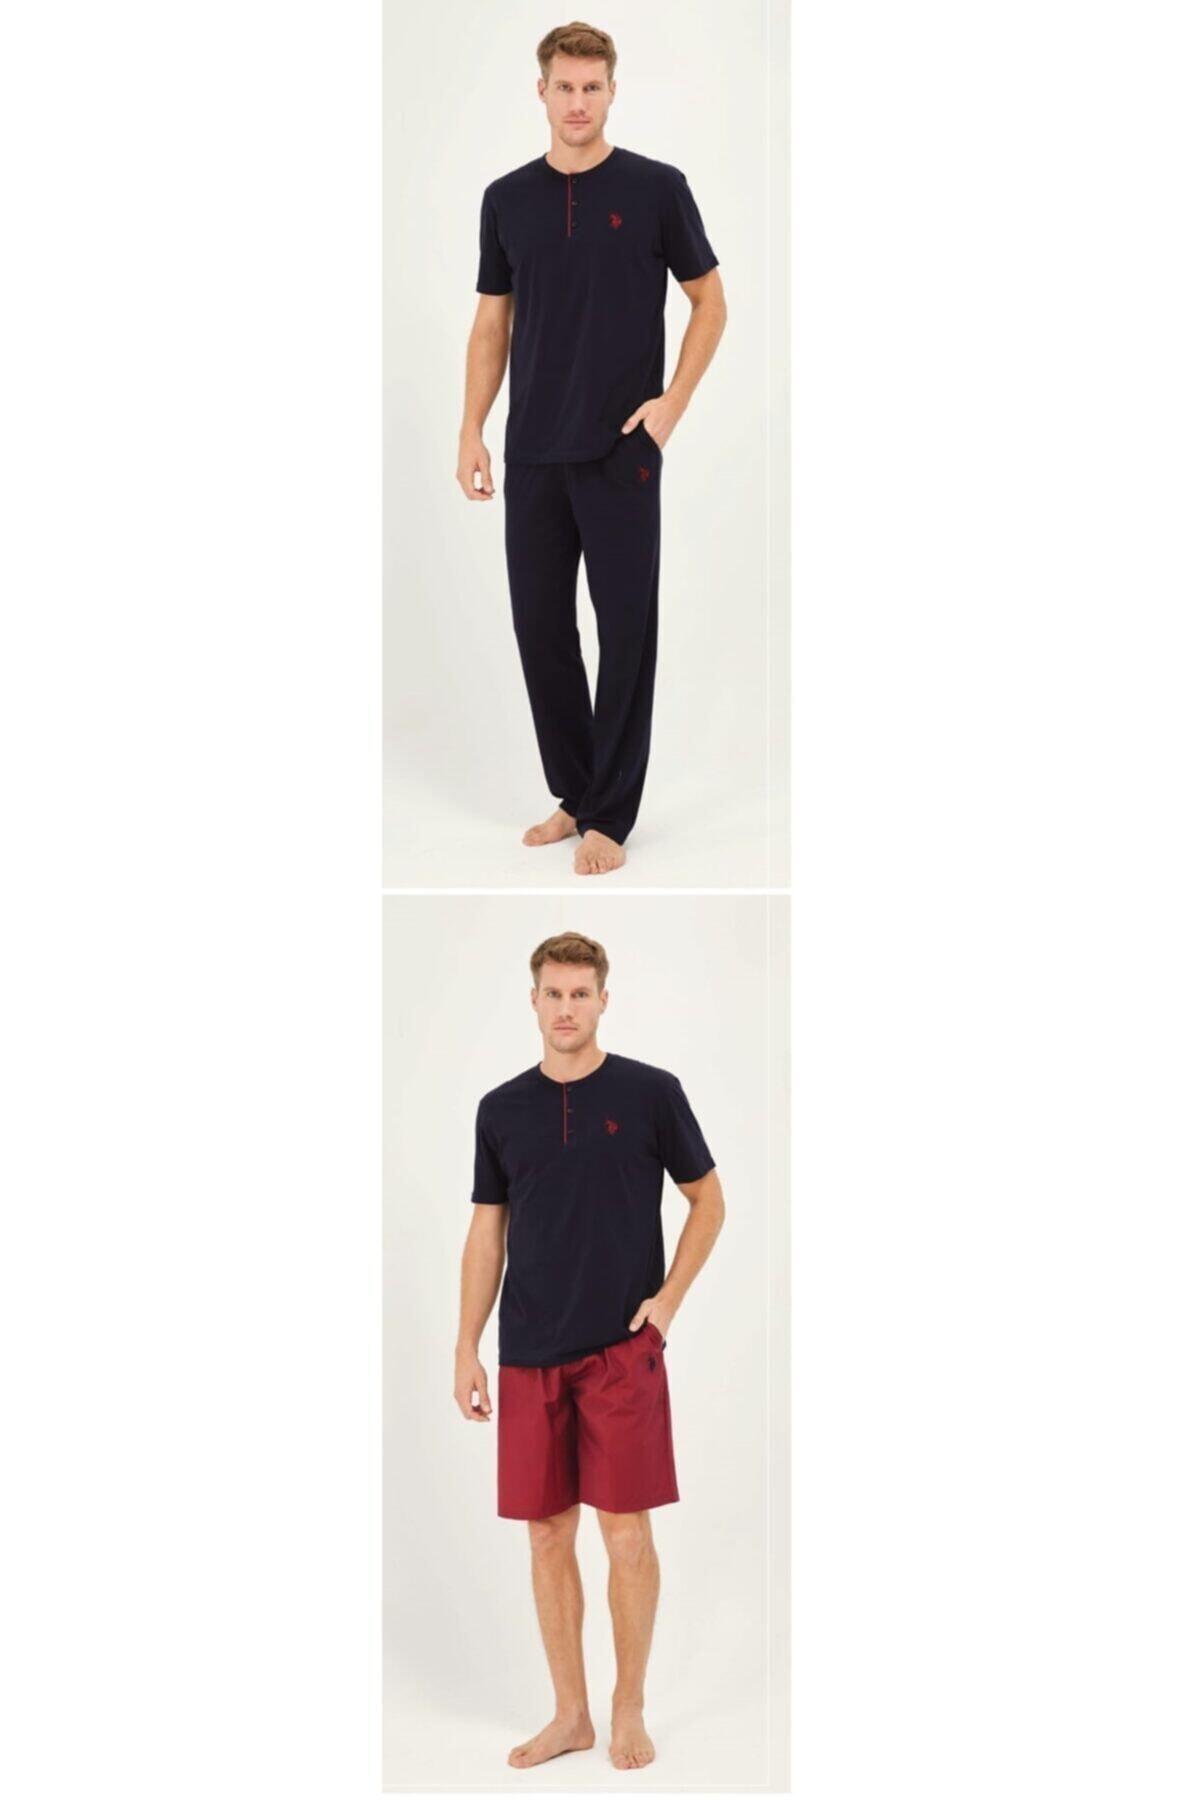 U.S. Polo Assn. Us Polo Lacivert Pijama Takım + Sort 12010 1